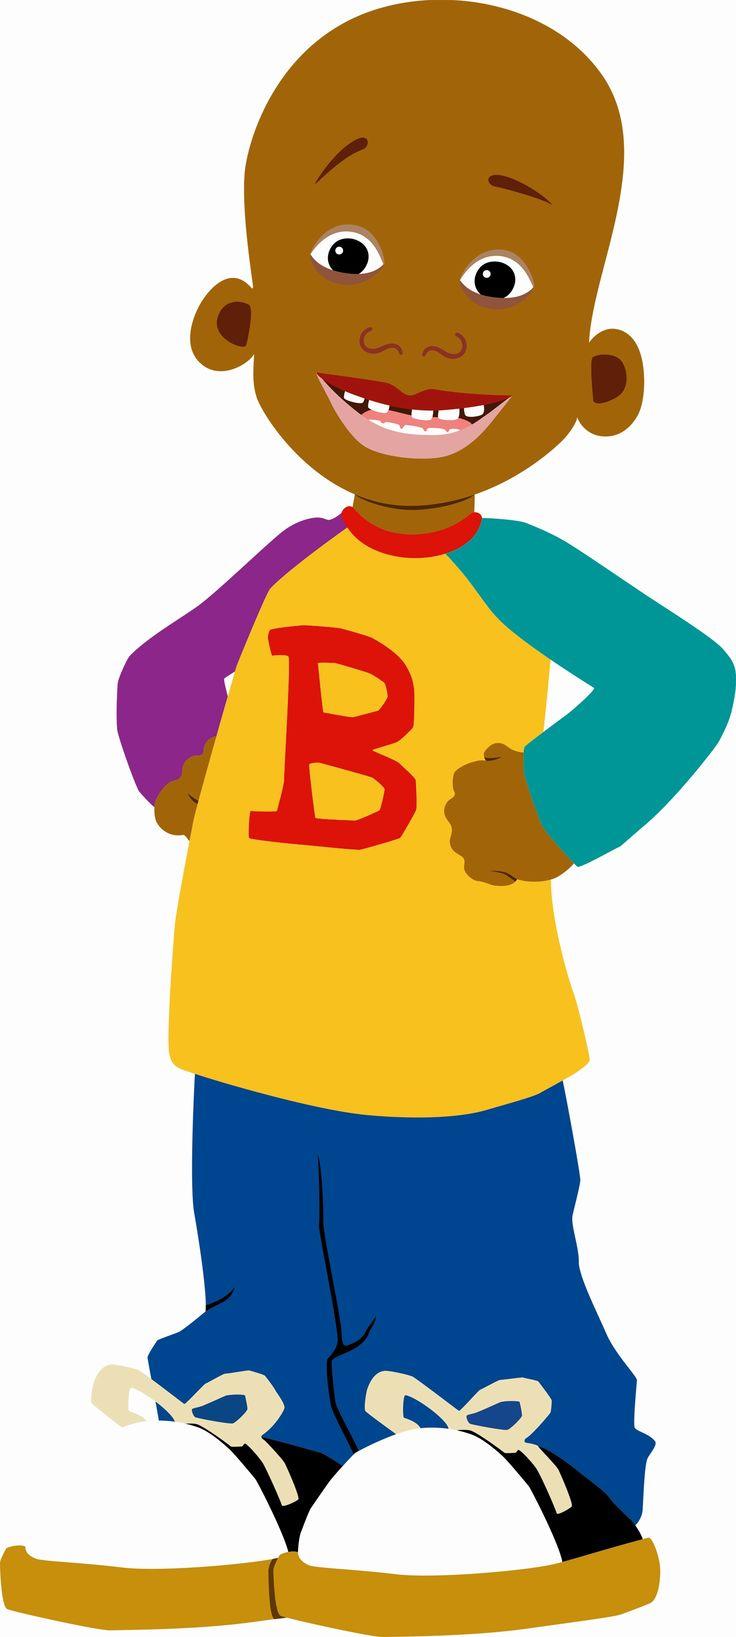 bill nick jr cartoon google lil character cartoons animated pjs stop brien depuis enregistree